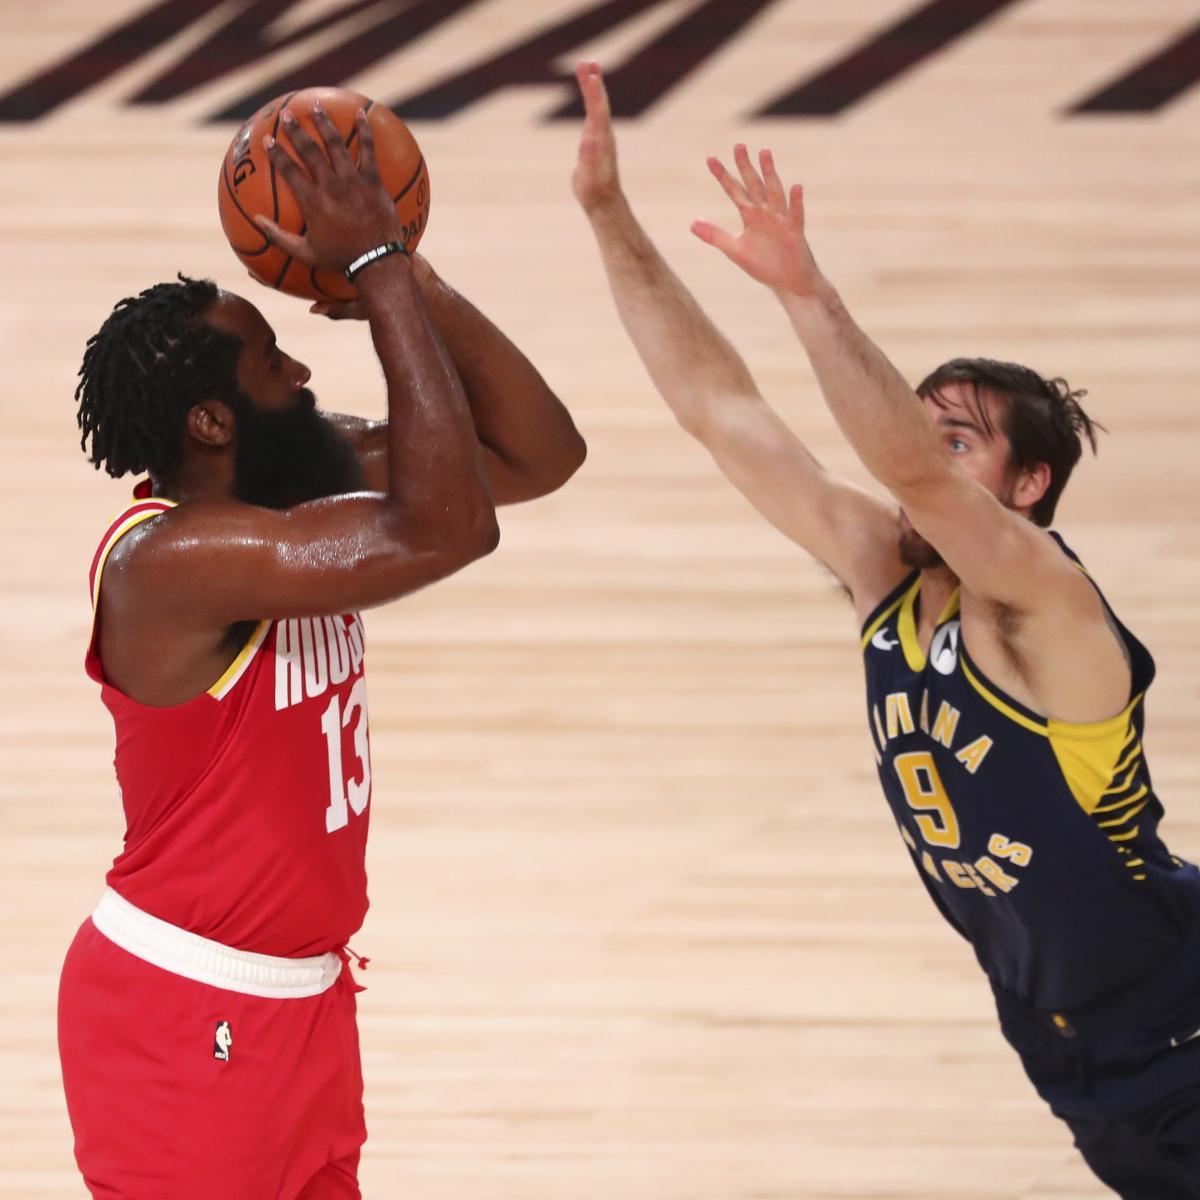 NBA Playoff Bracket 2020: Full Review of Postseason ...